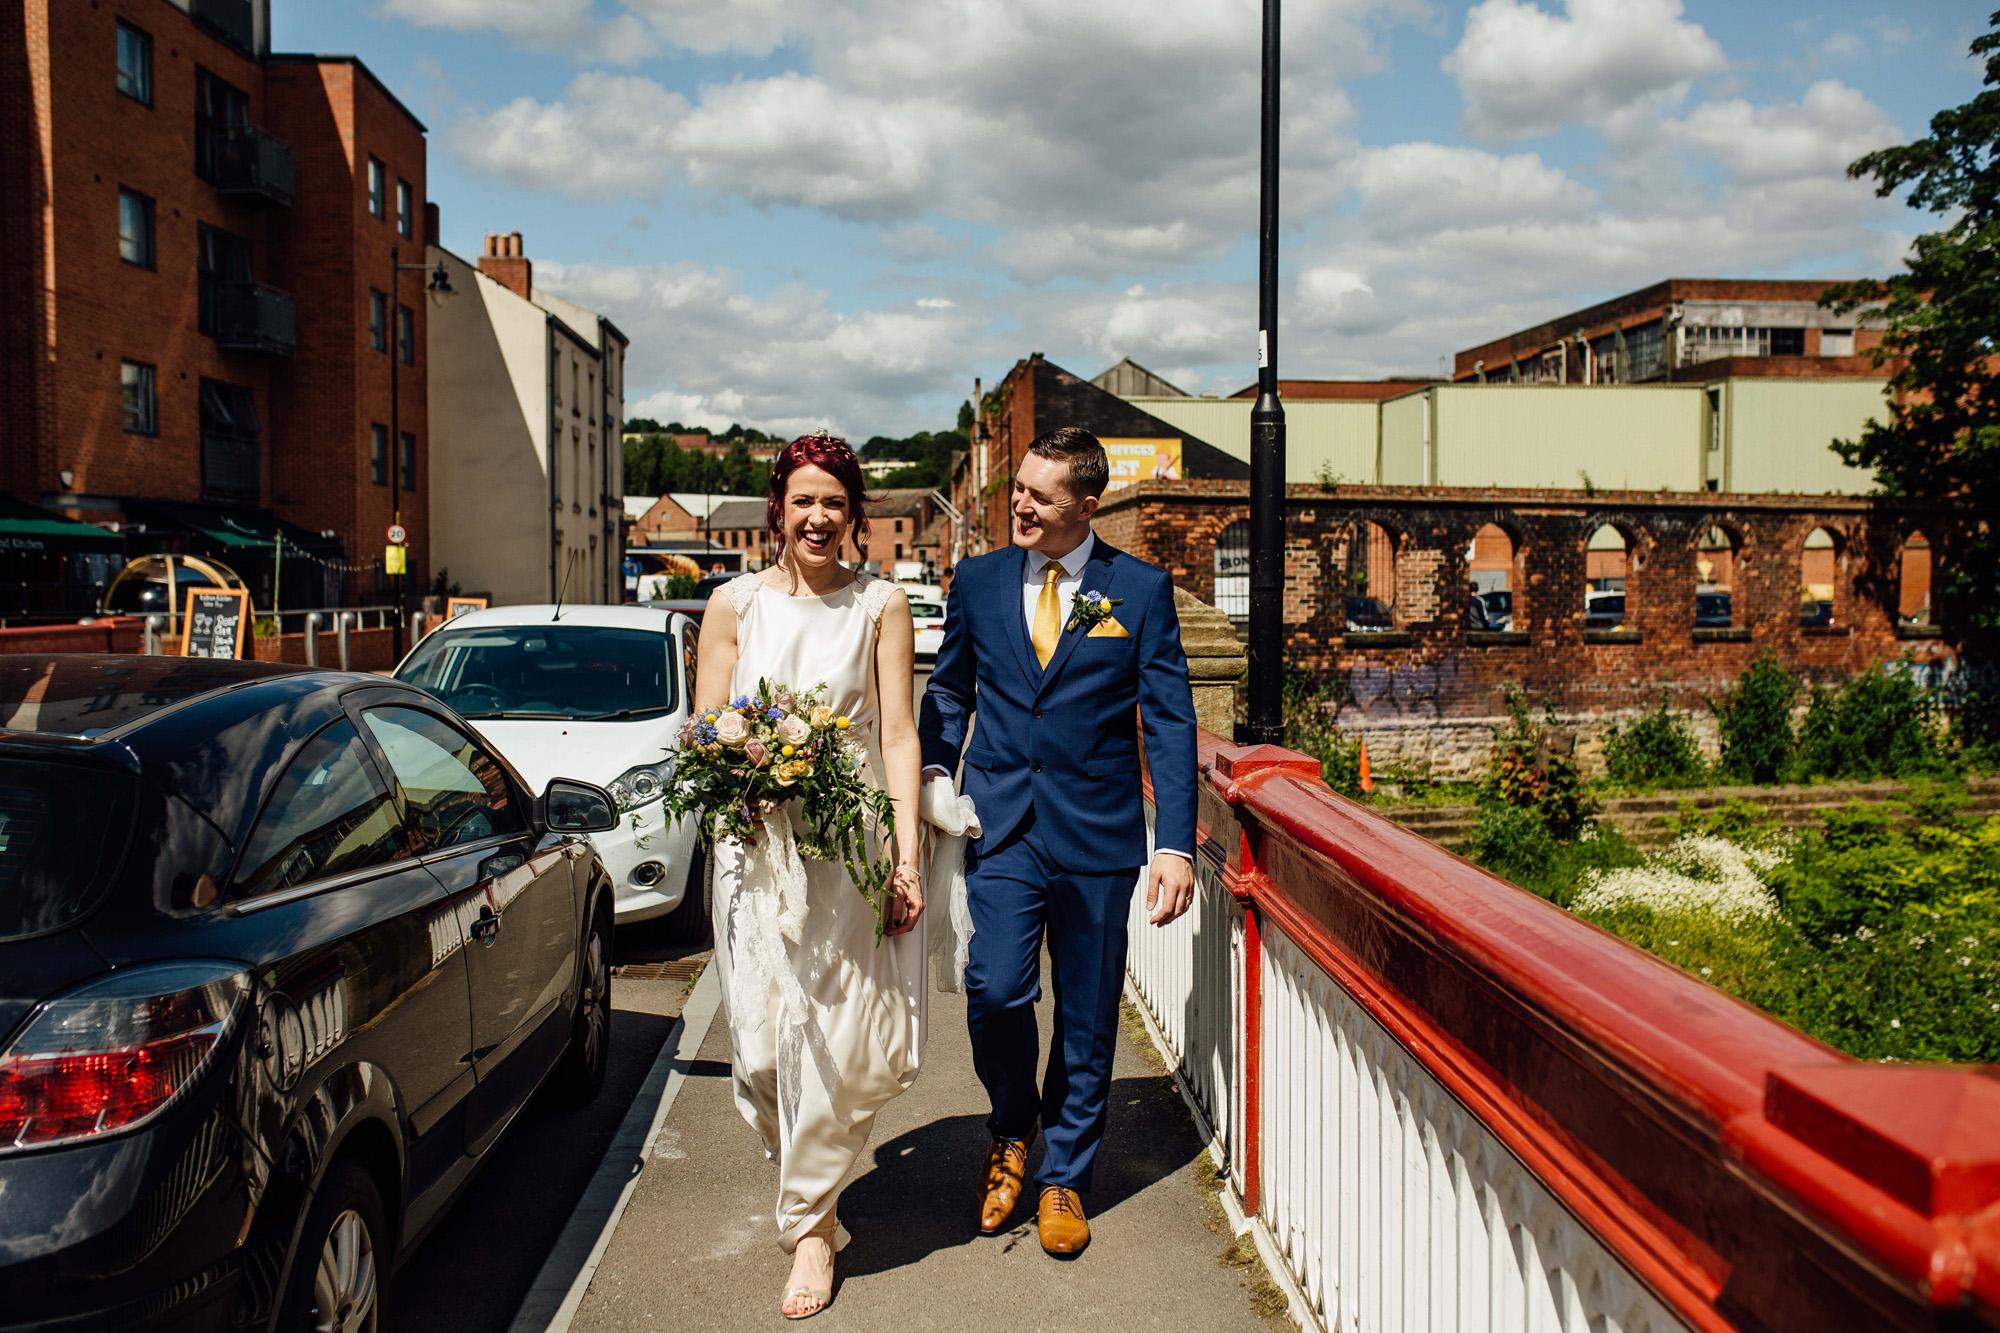 Sarah-Honeysuckle-Bias-Cut-Silk-Vintage-Inspired-Wedding-Gown-Sheffield-Wedding-Kate-Beaumont-29.jpg